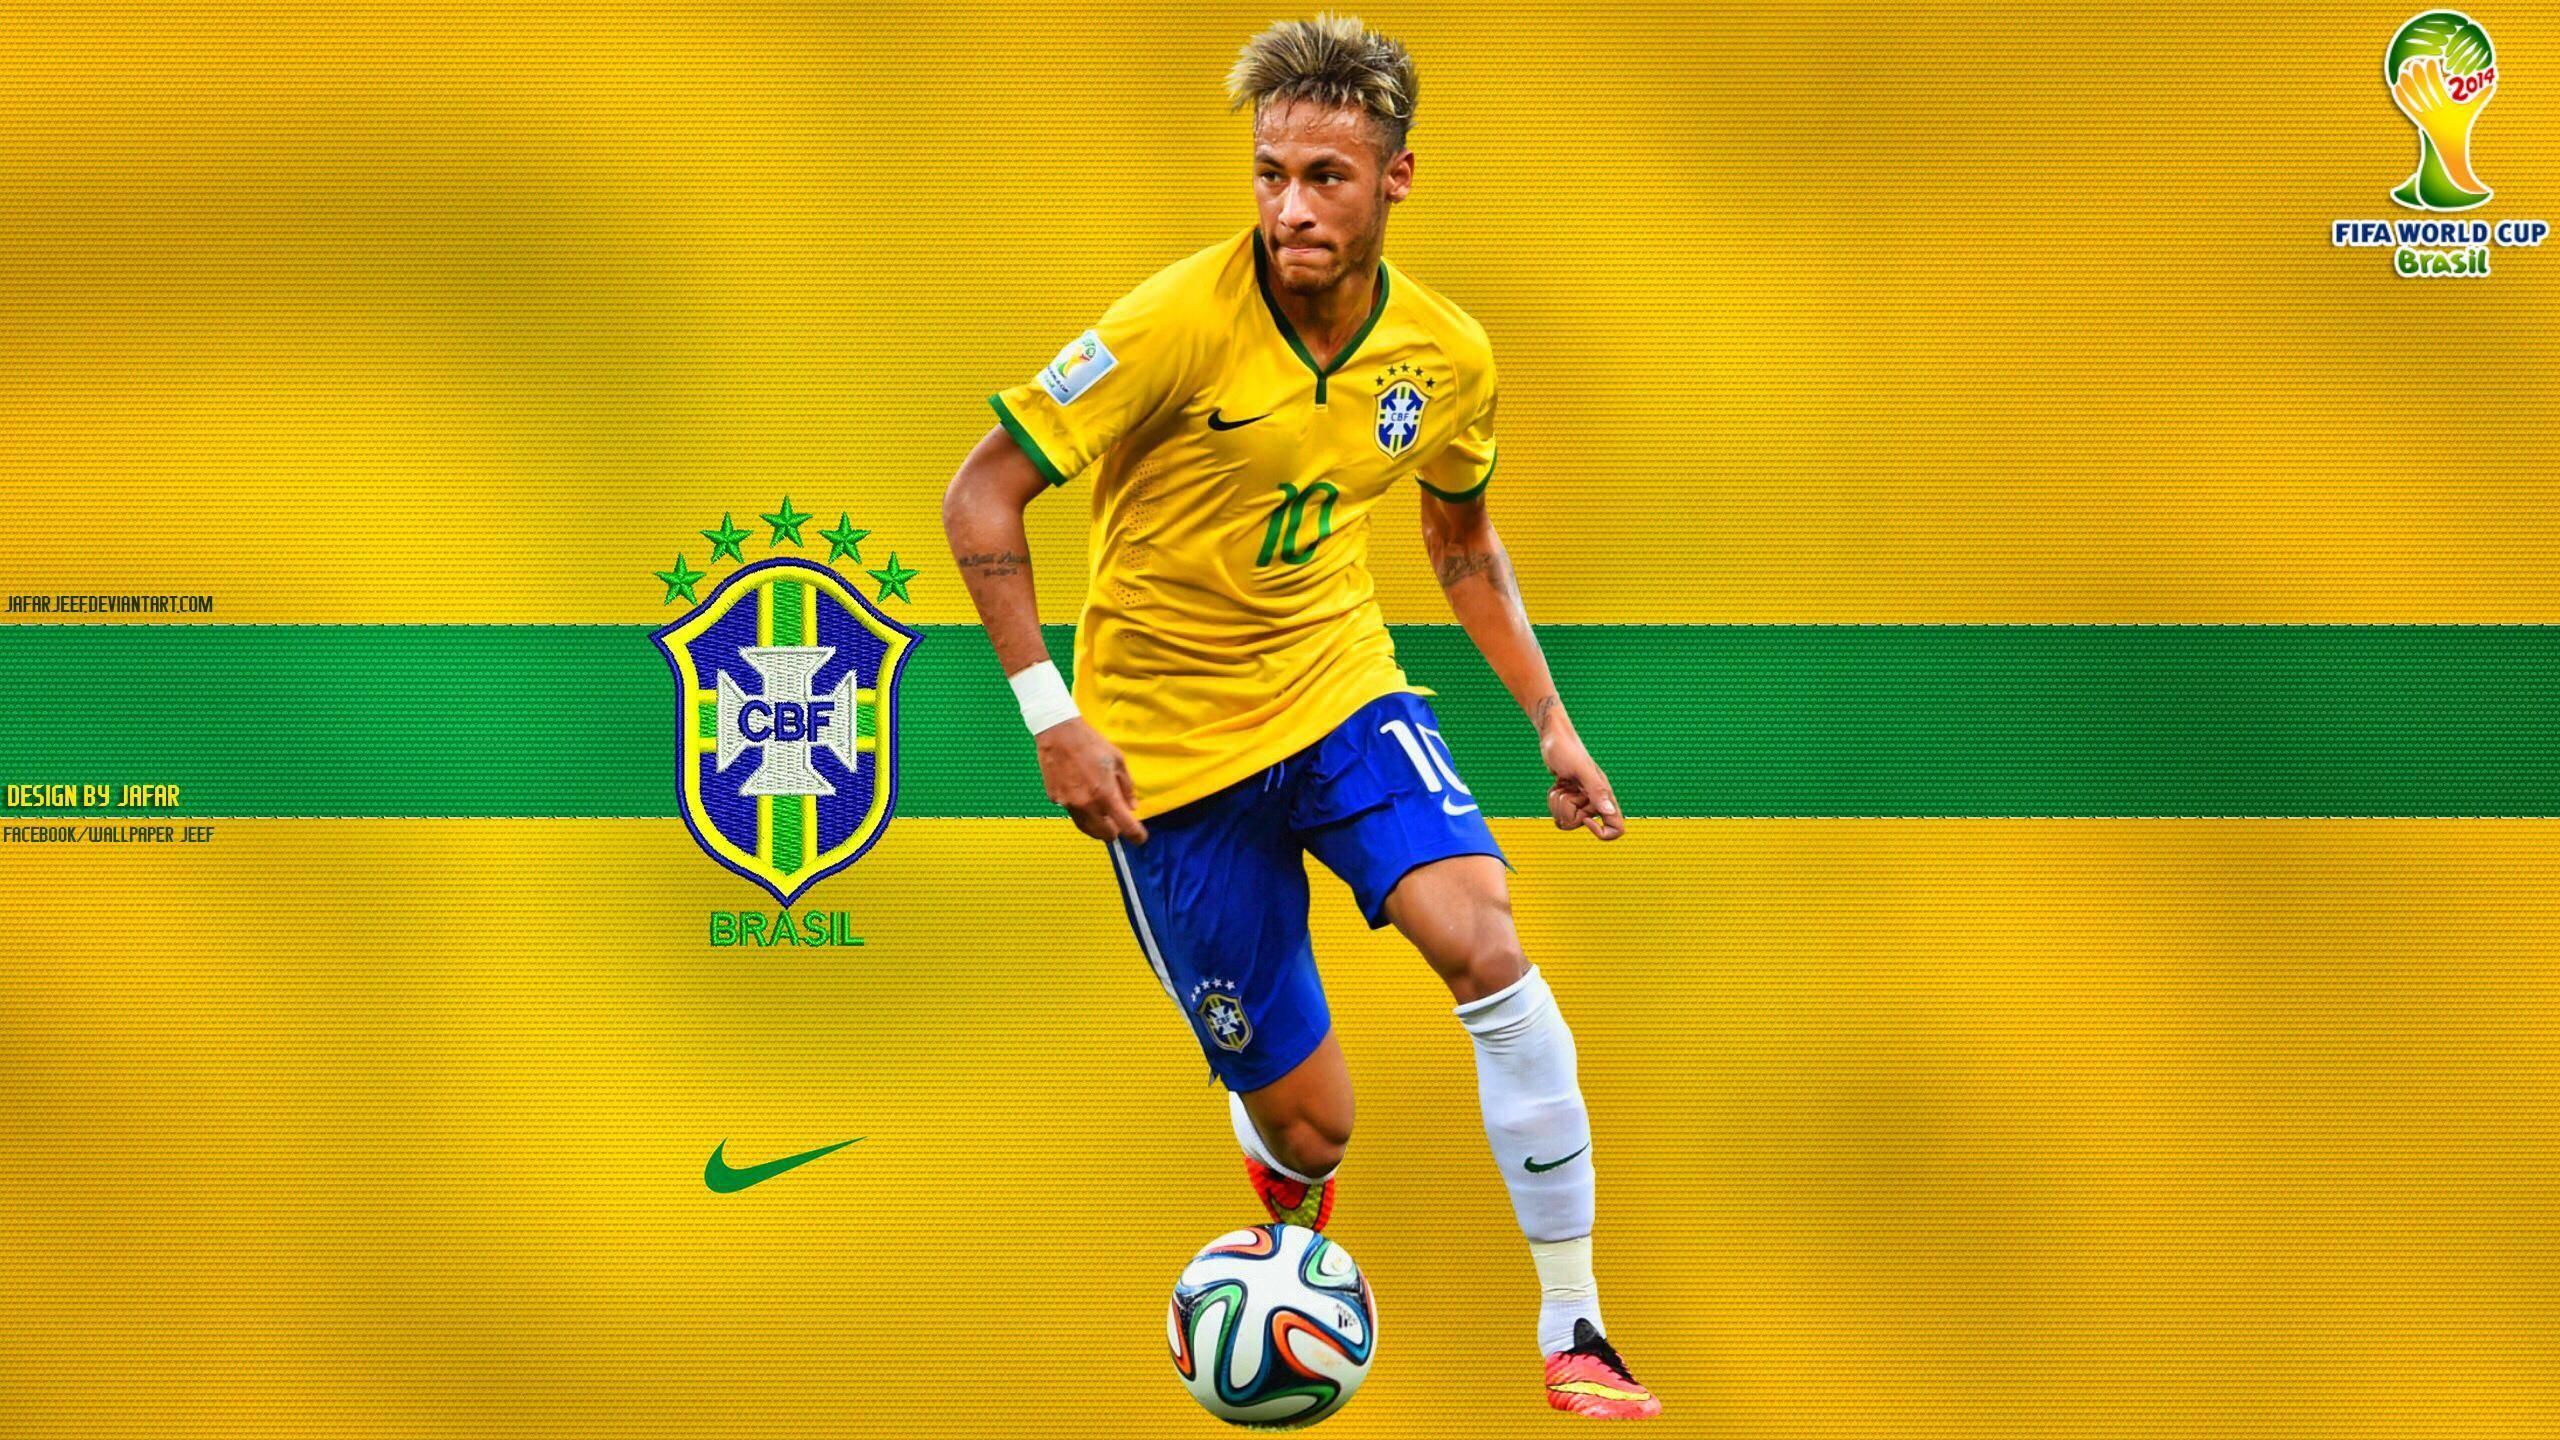 Neymar Wallpapers 2015 HD – Wallpaper Cave